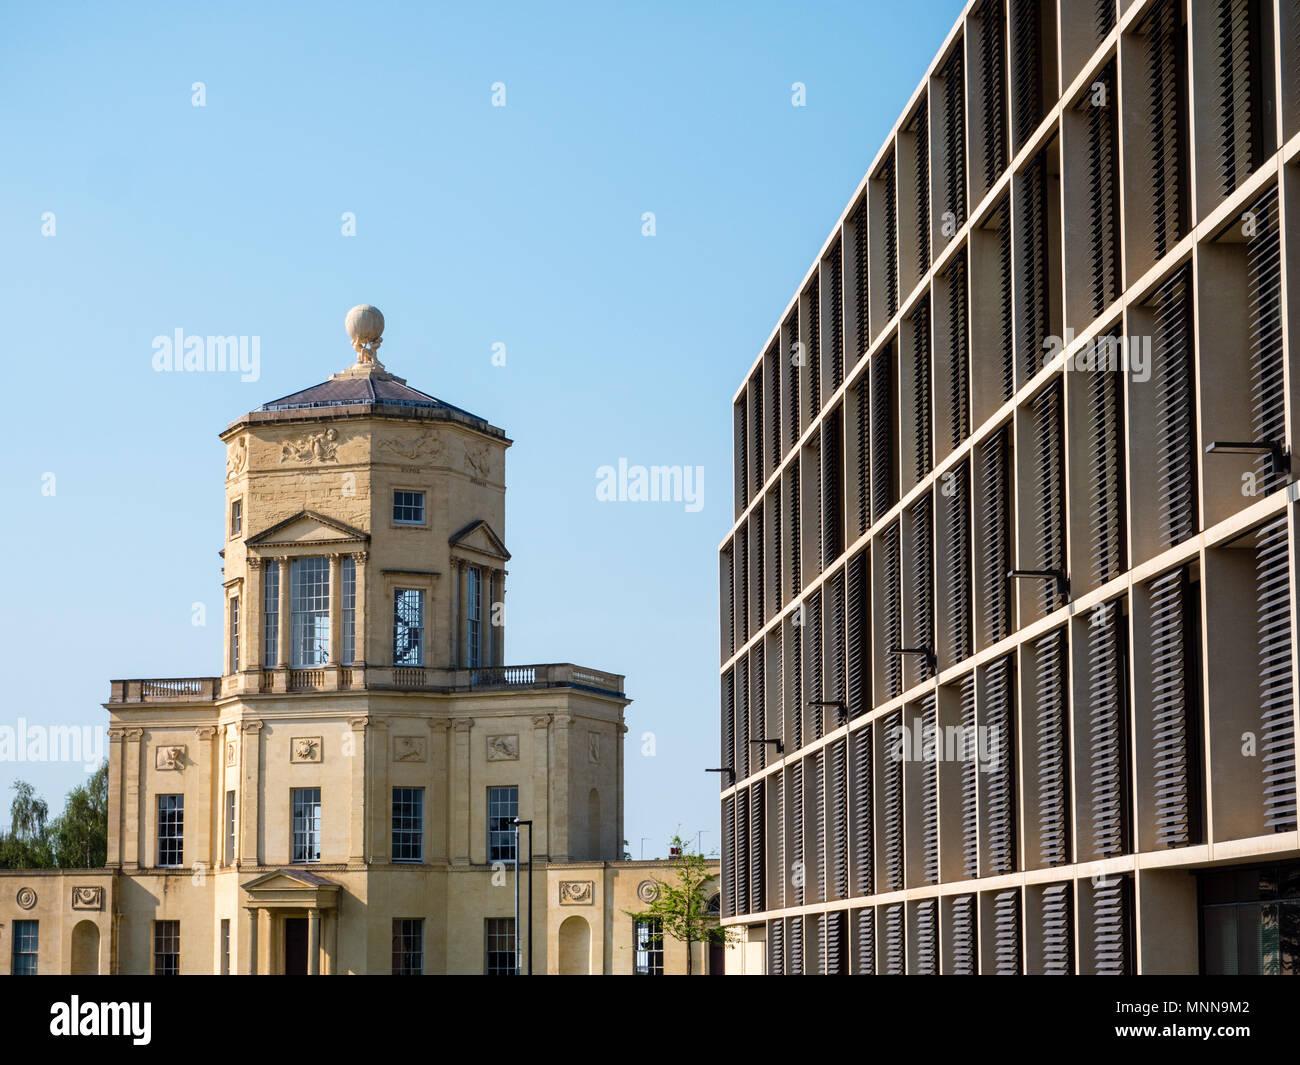 grade I listed Radcliffe Observatory, Radcliffe Observatory Quarter, University of Oxford, Oxford, Oxfordshire, England, UK, GB. - Stock Image